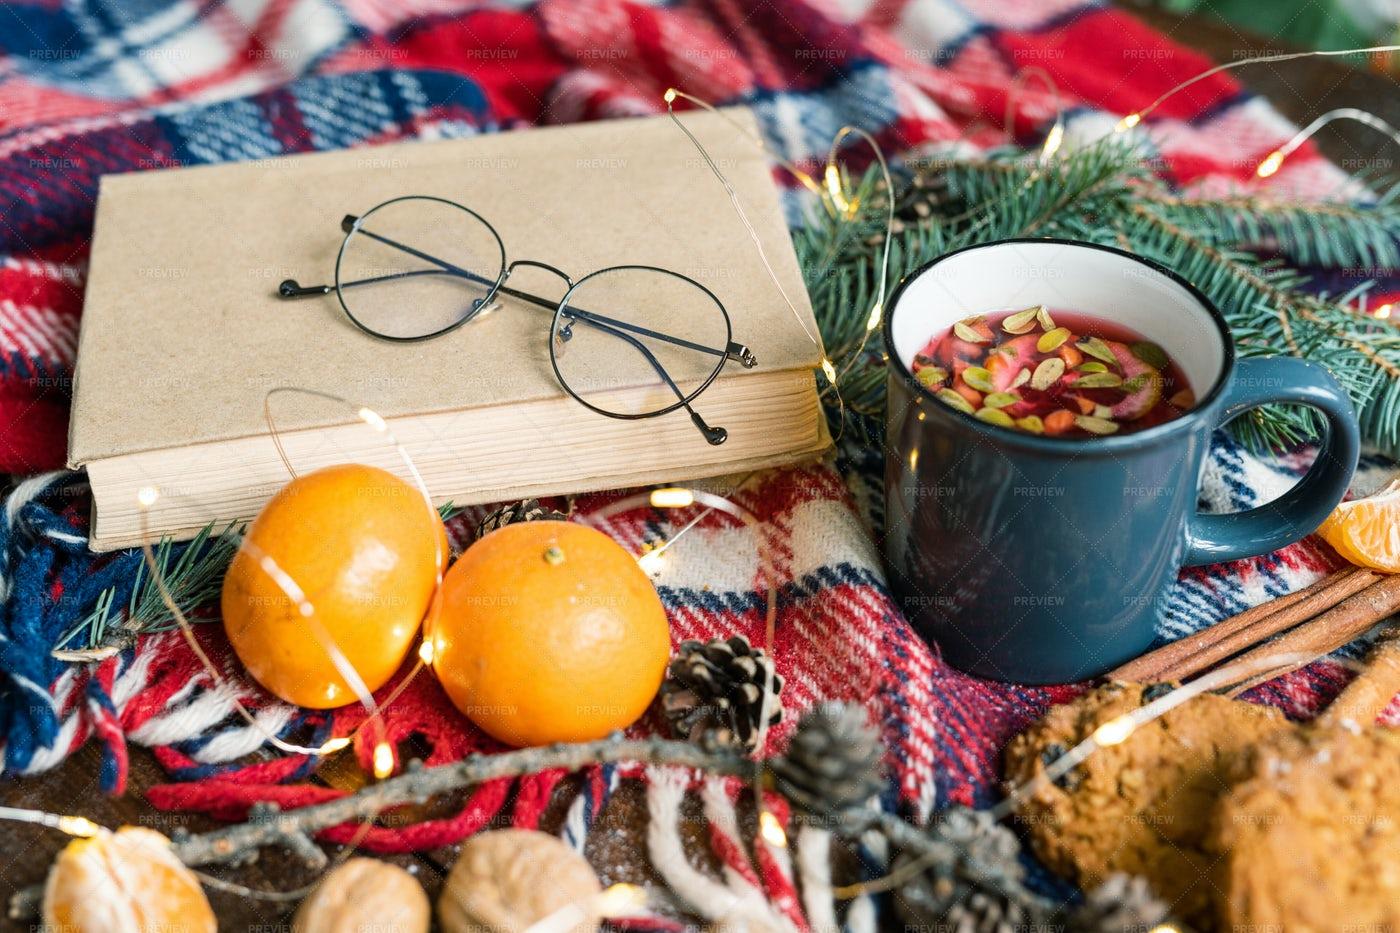 Book With Eyeglasses, Mug Of Hot...: Stock Photos